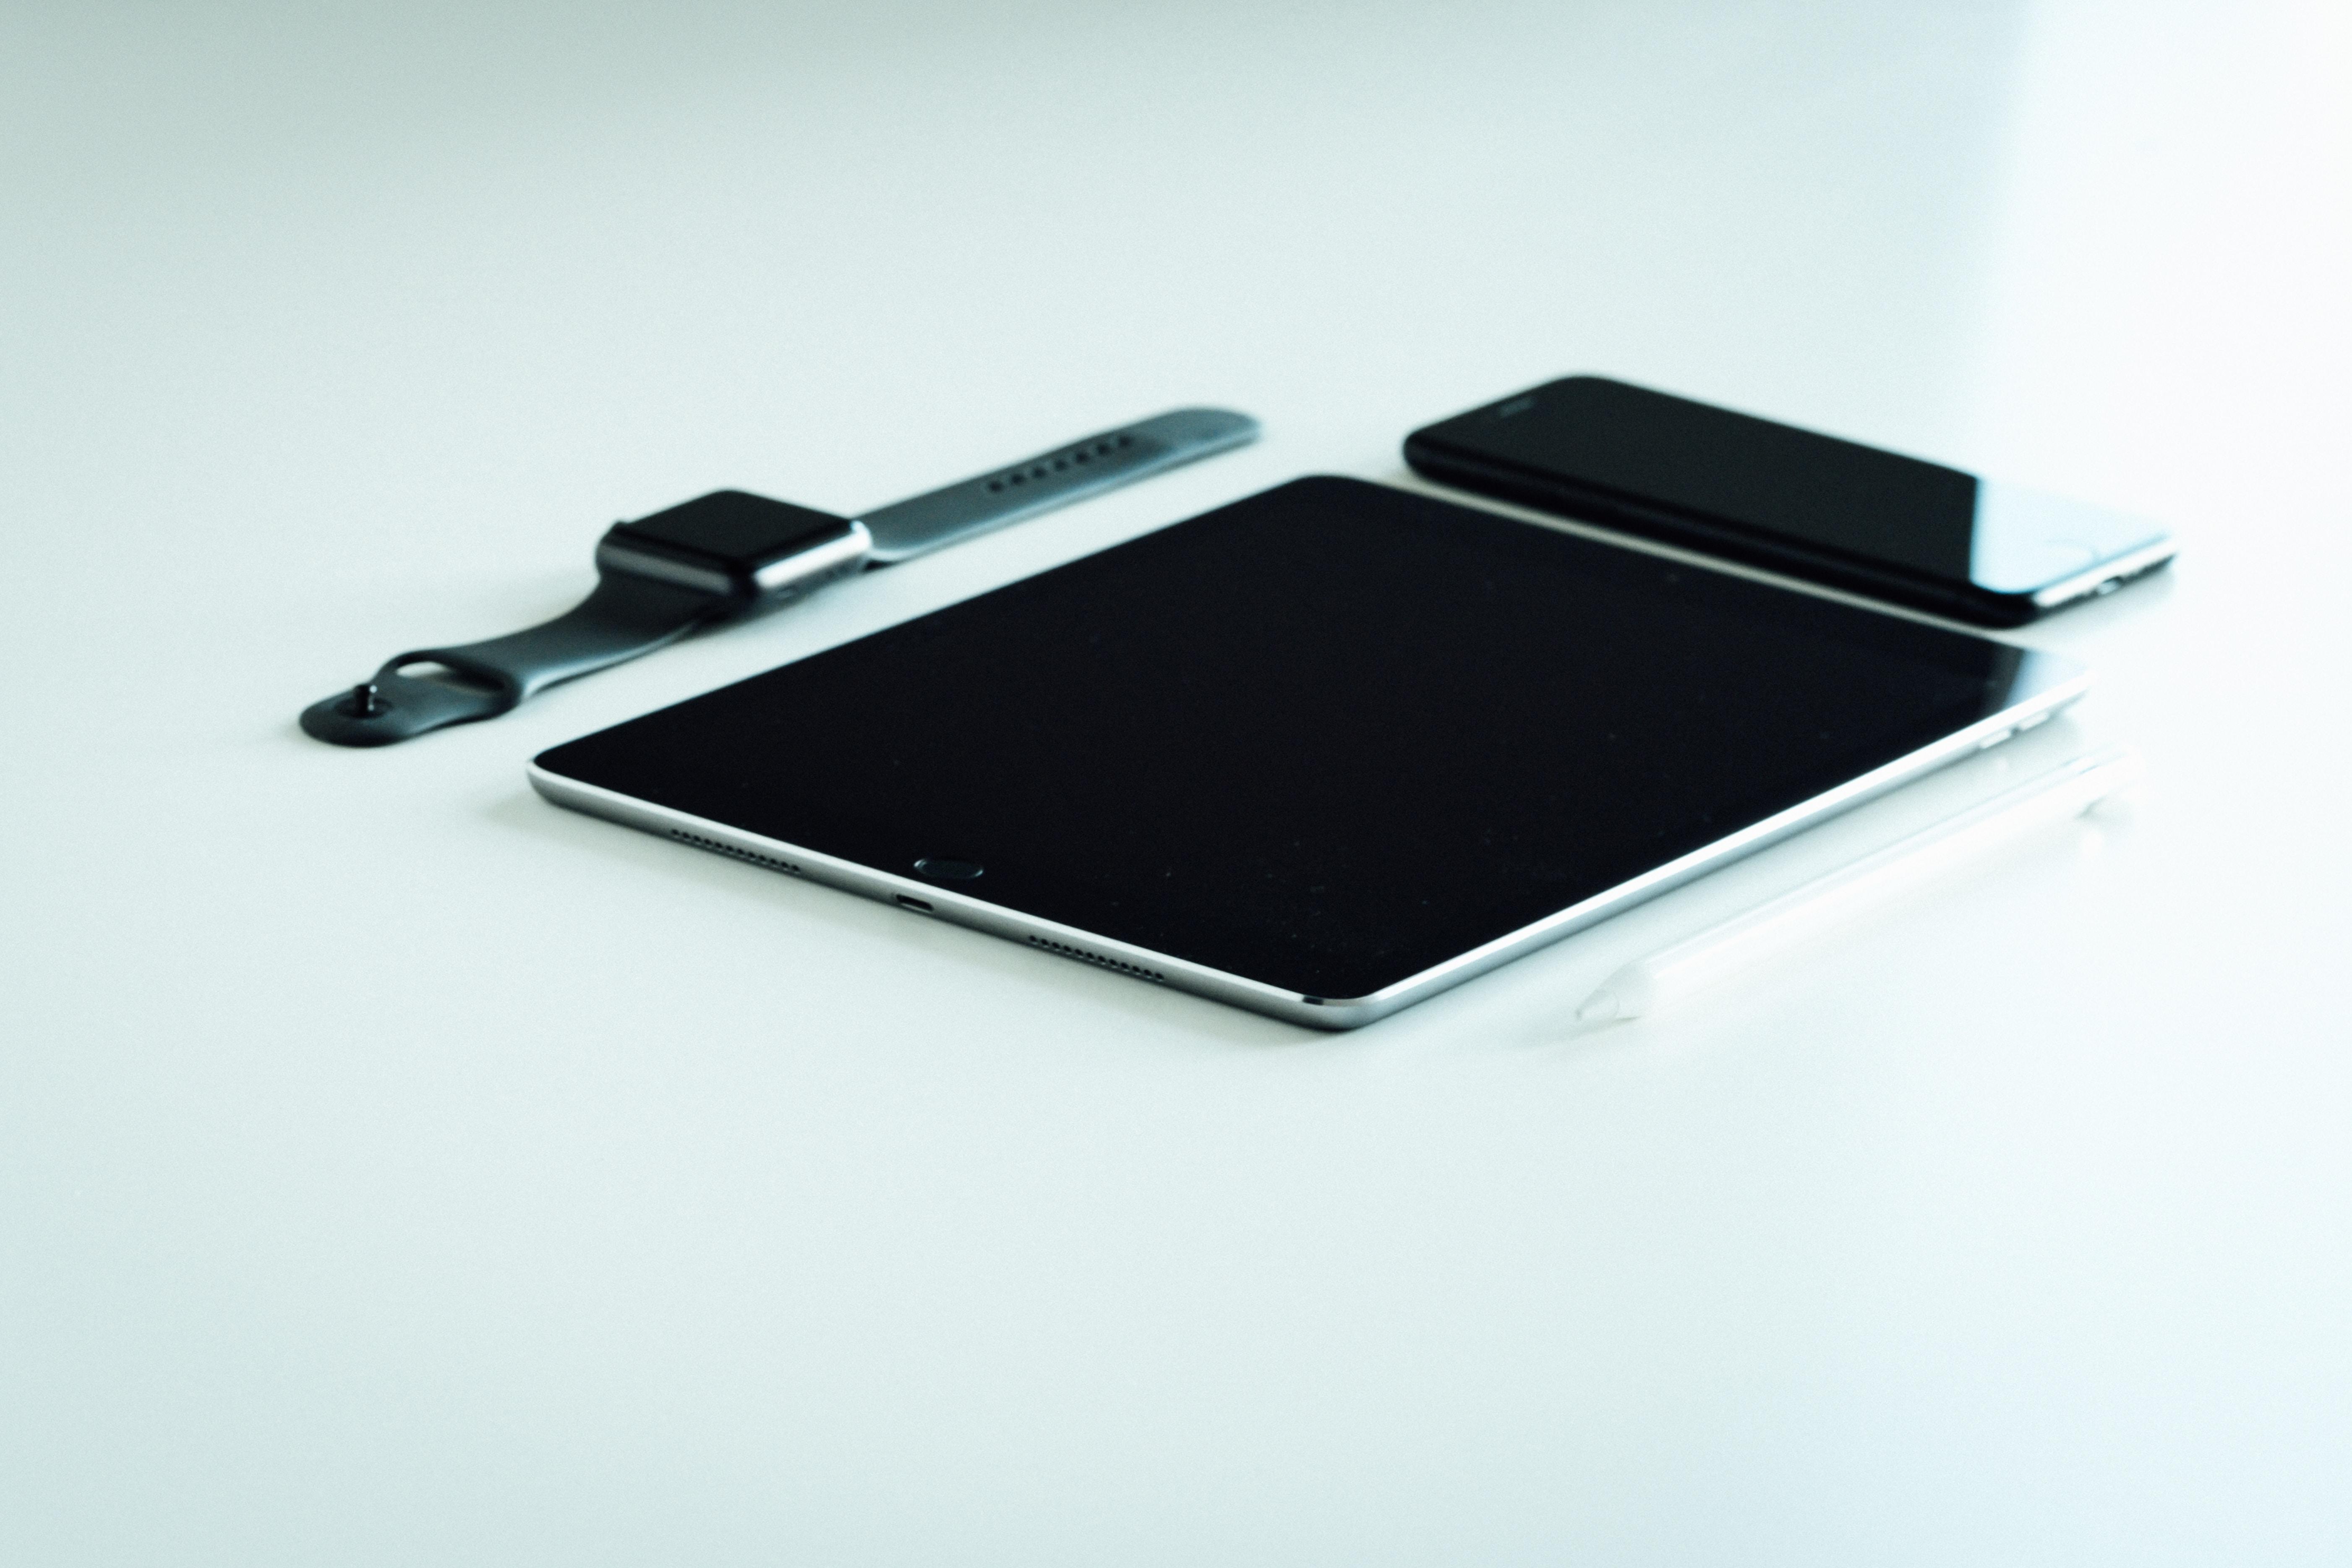 Tablet, telefone e relógio